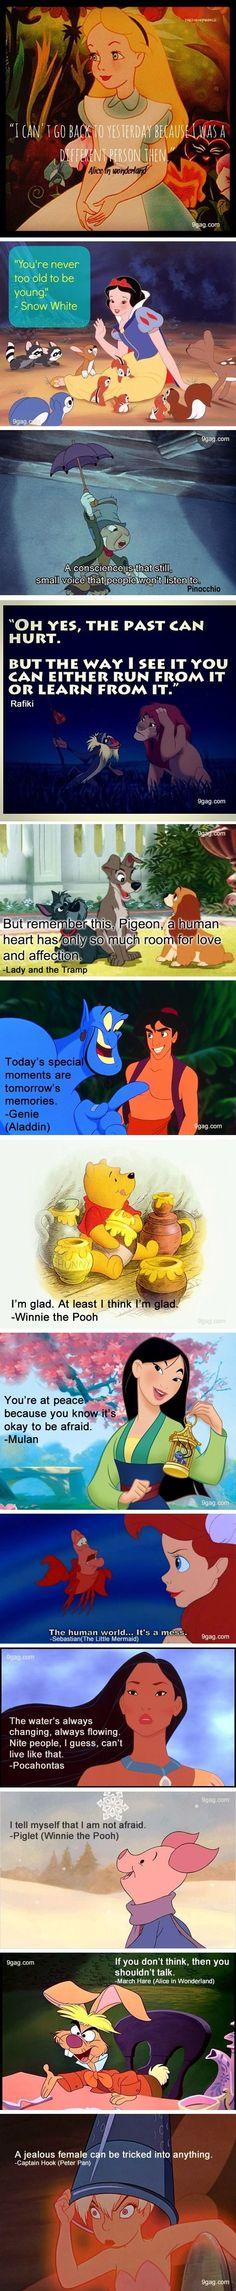 Aladdin and Winnie the Pooh